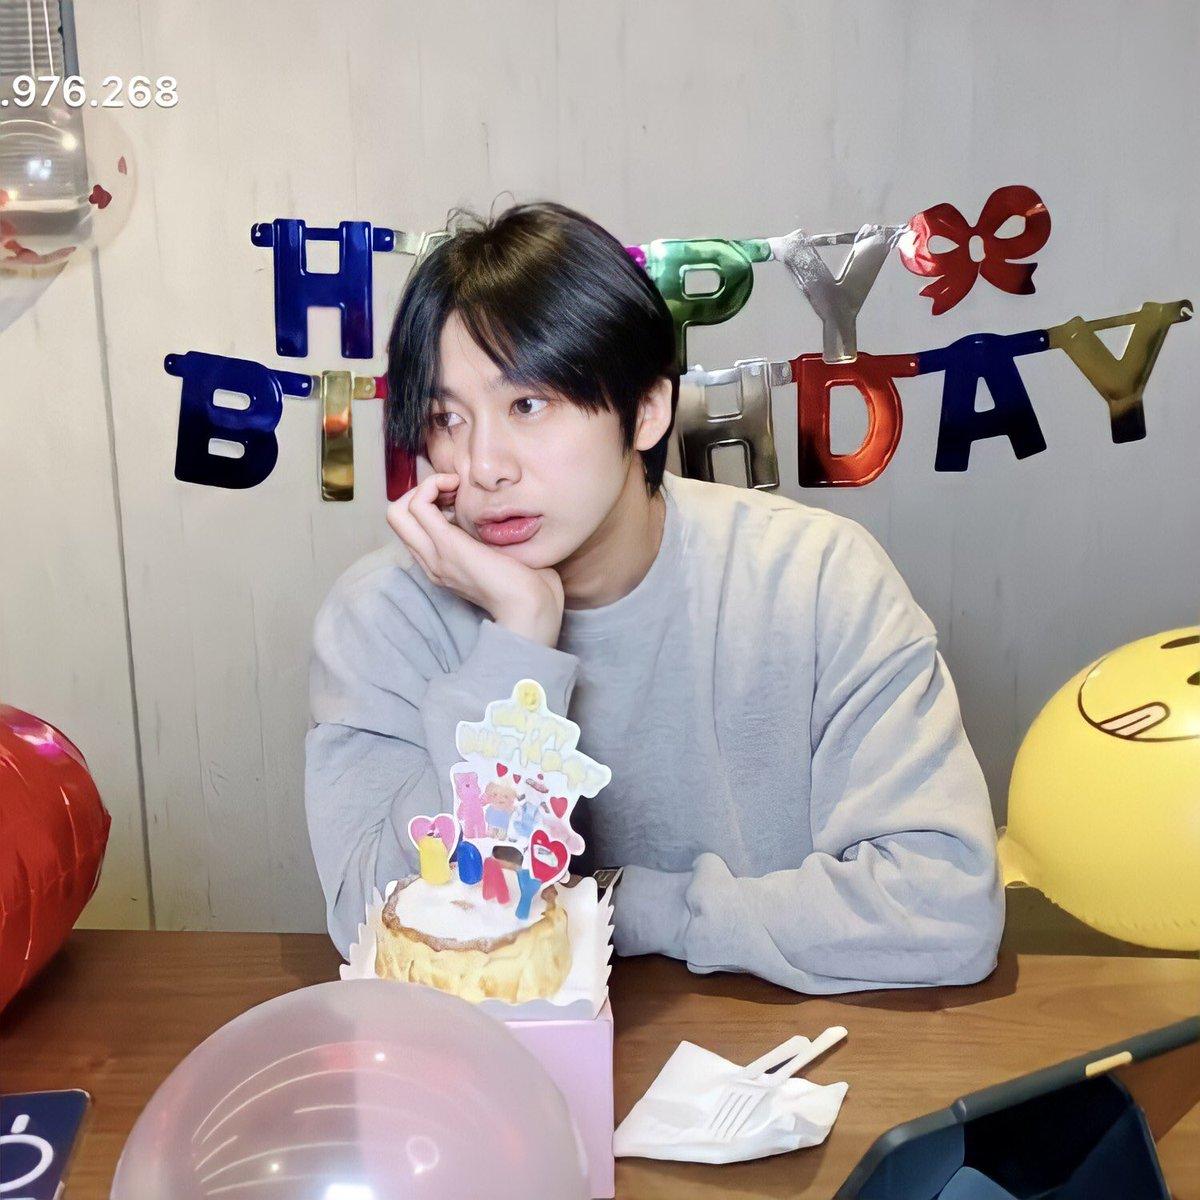 ♡̆̈hyungwon vlive birthday a thread ෆ @OfficialMonstaX #형원 #HBDtoHYUNGWON ఇ #NobodyElseButHyungwon